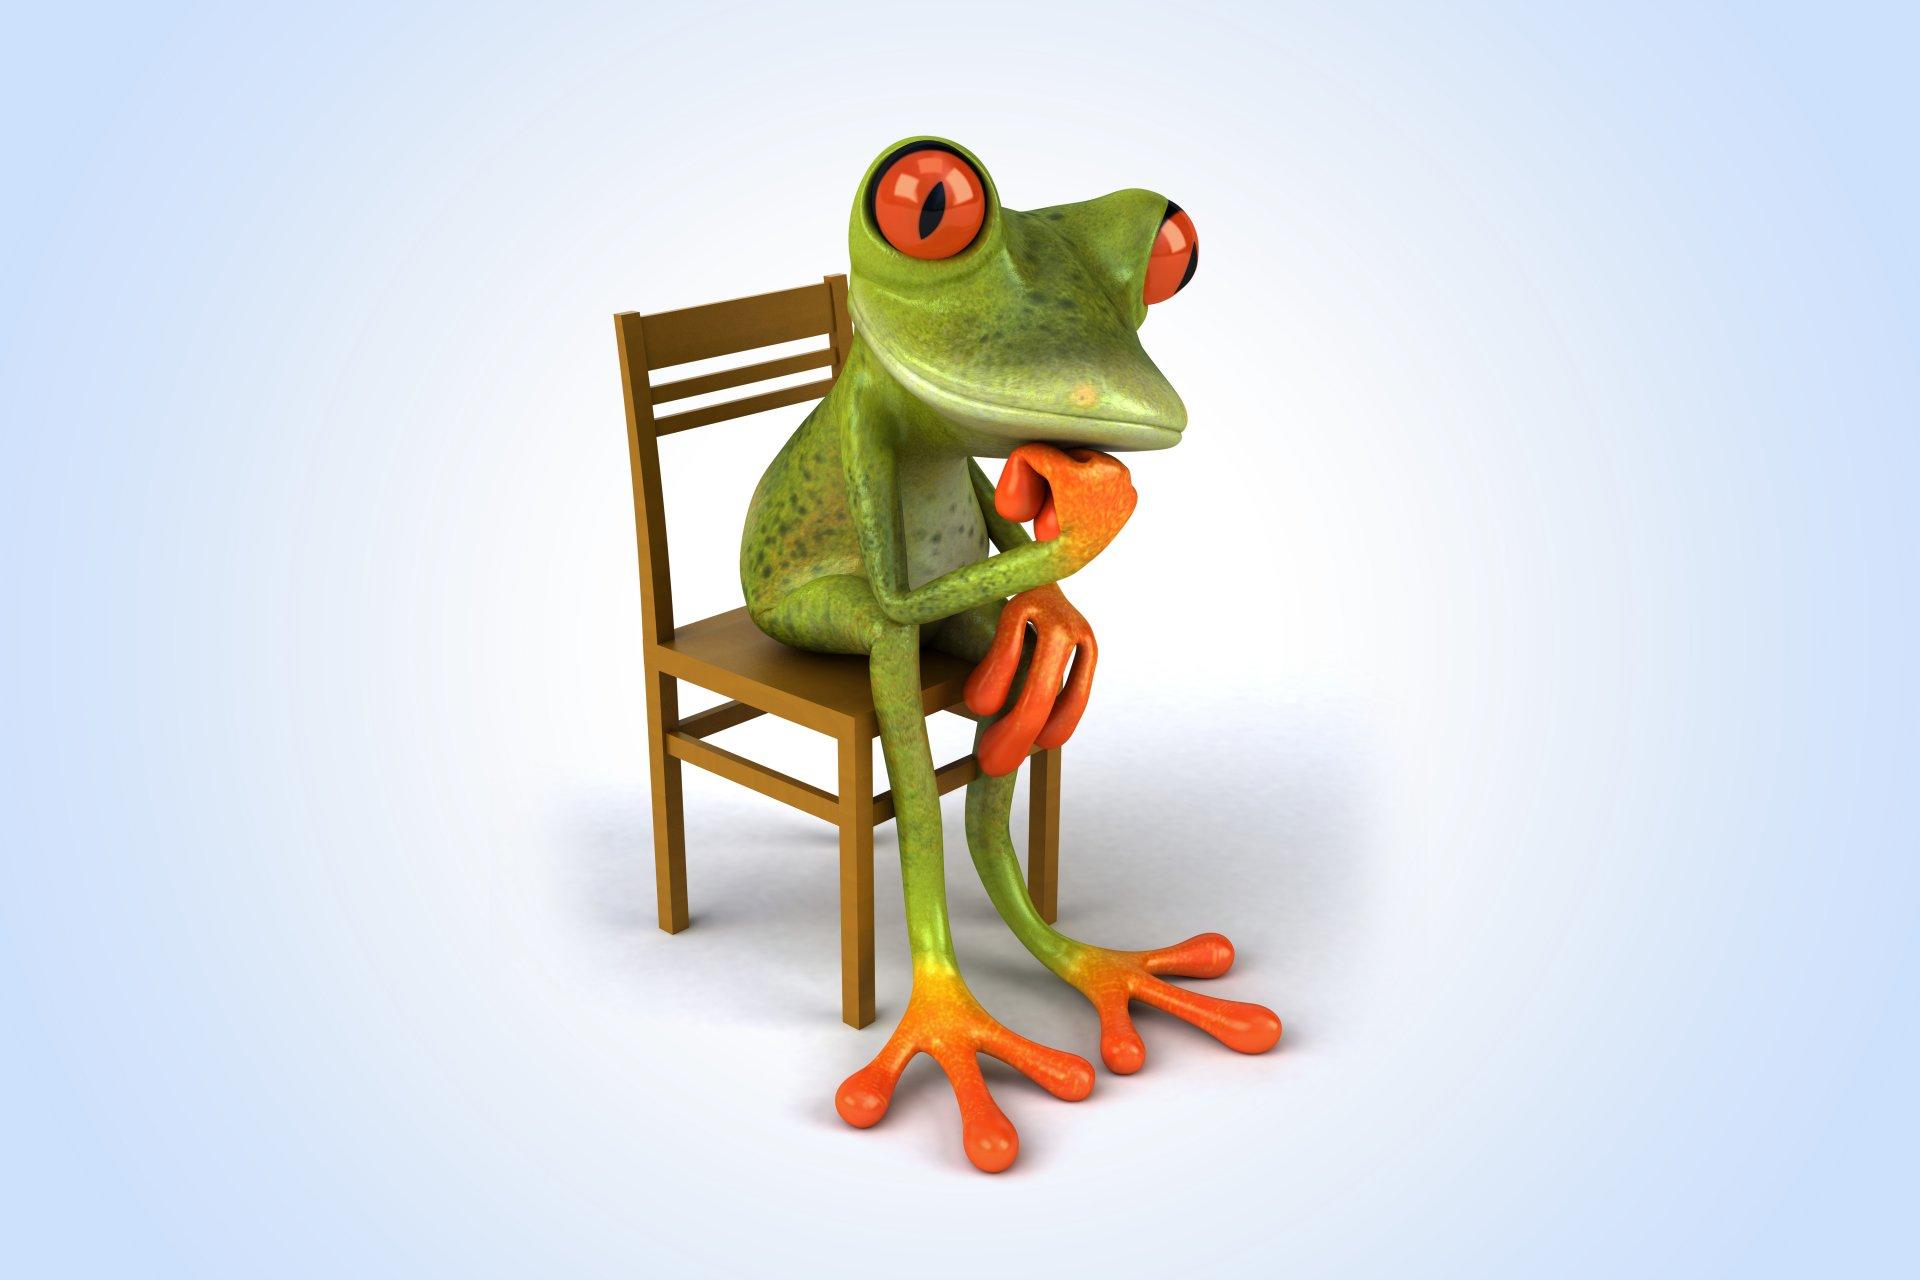 забавня жабка бесплатно